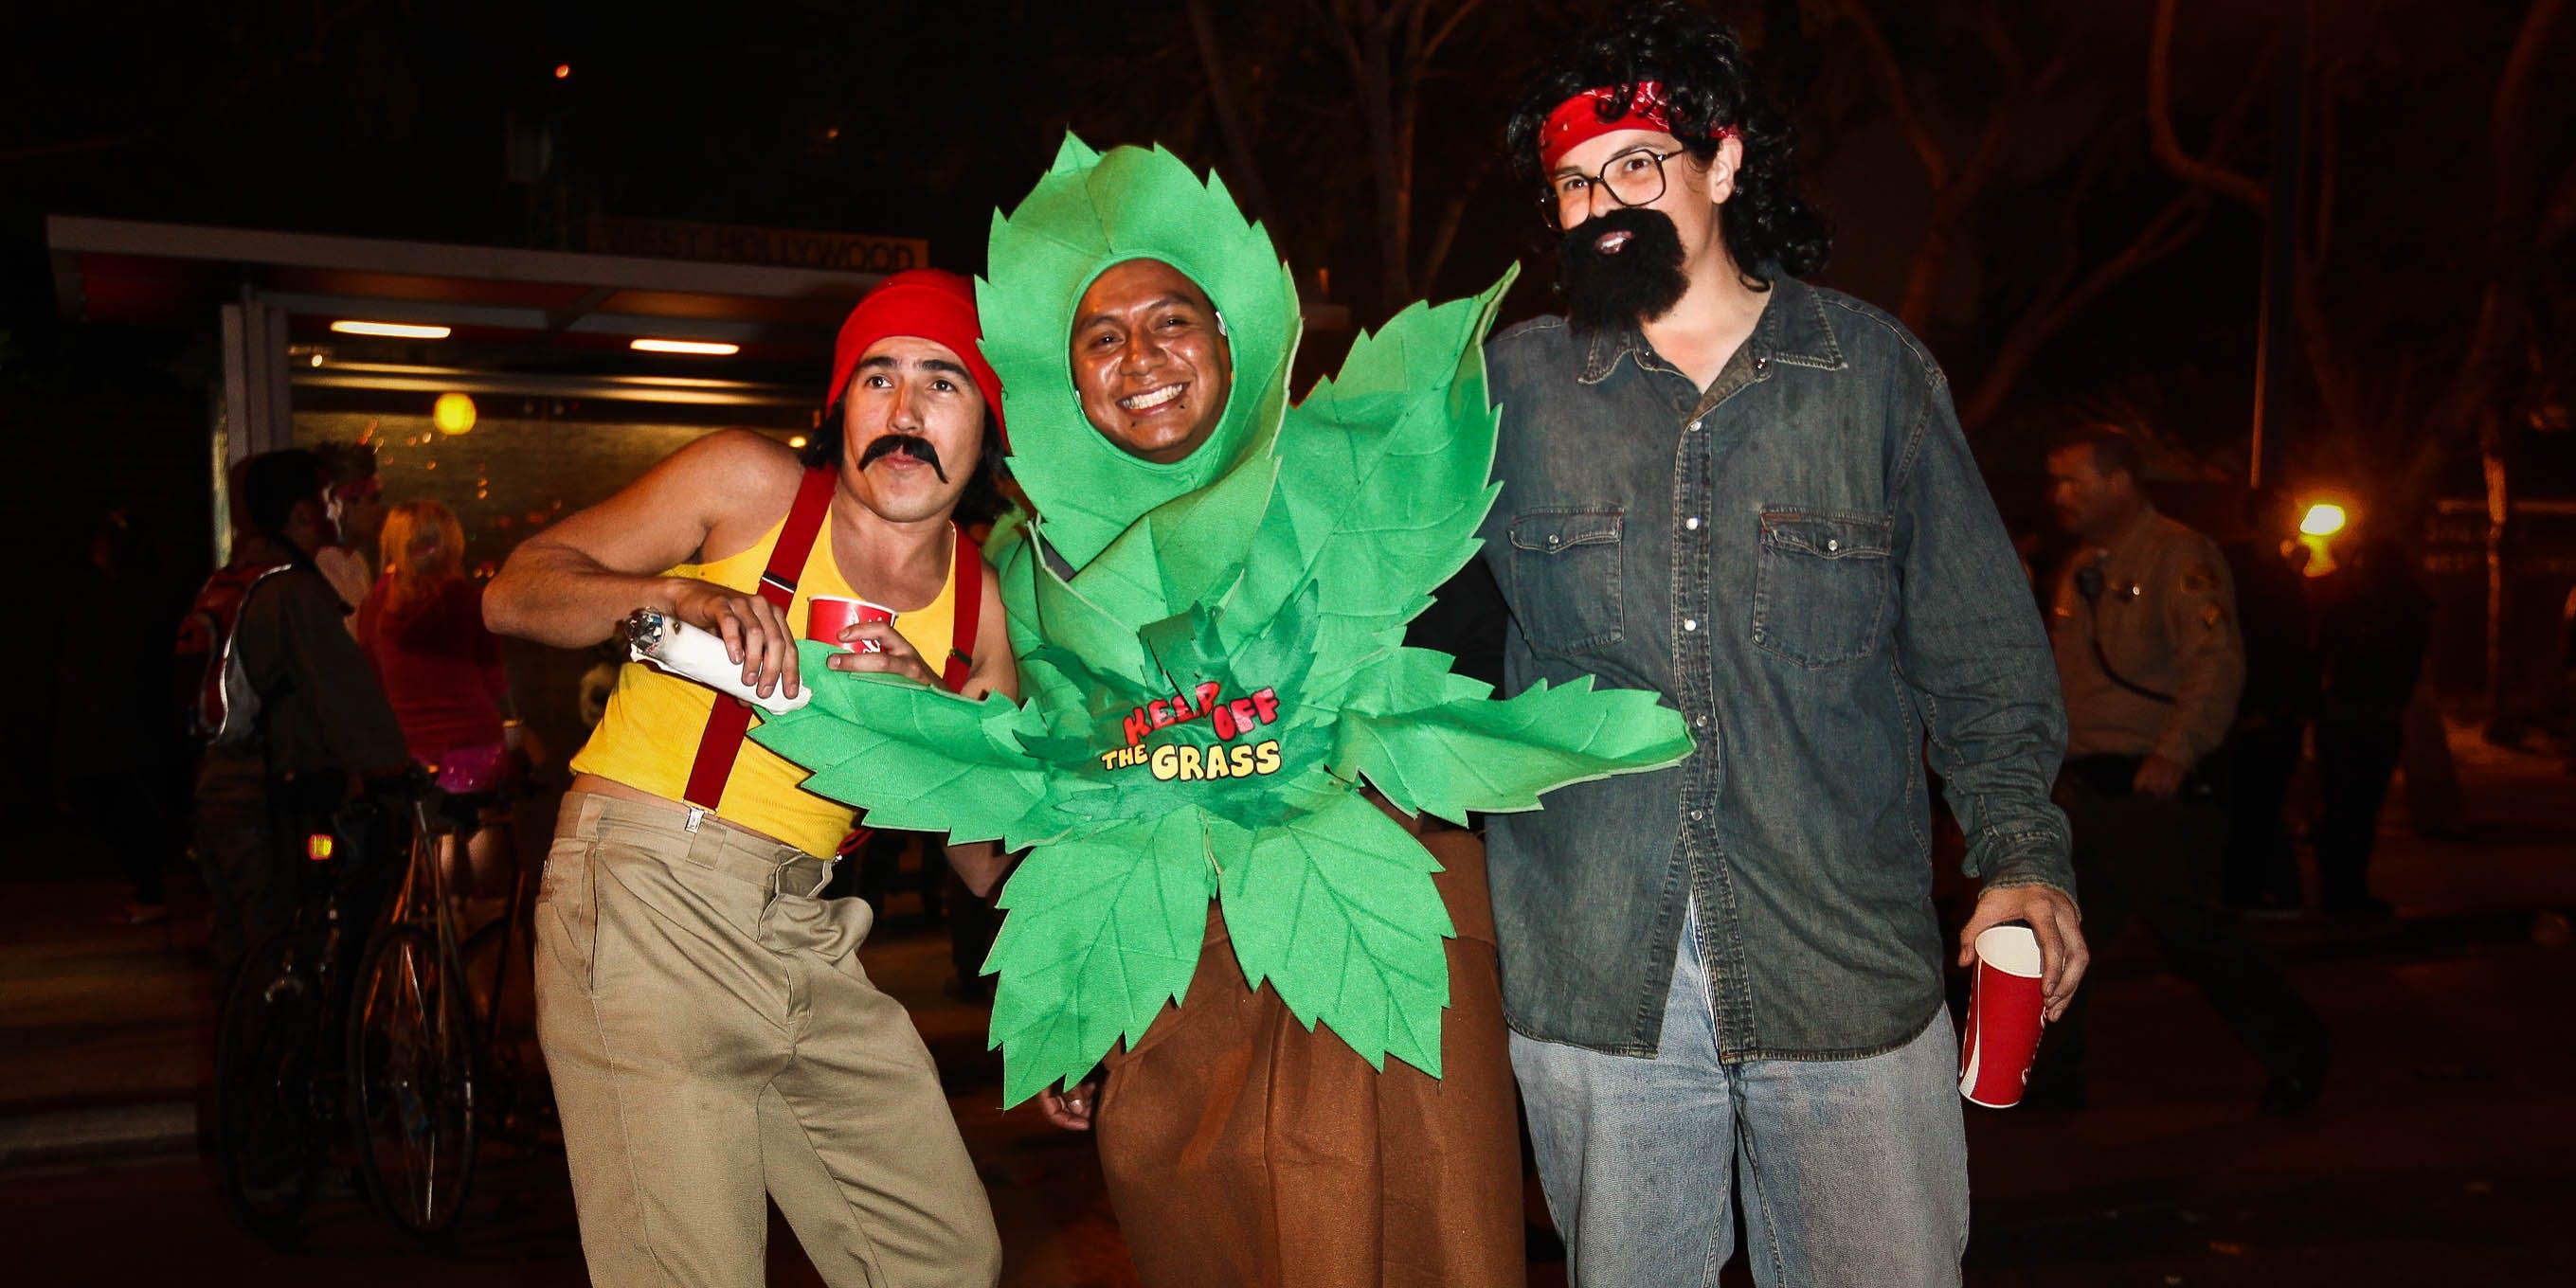 halloween weed costume ideas